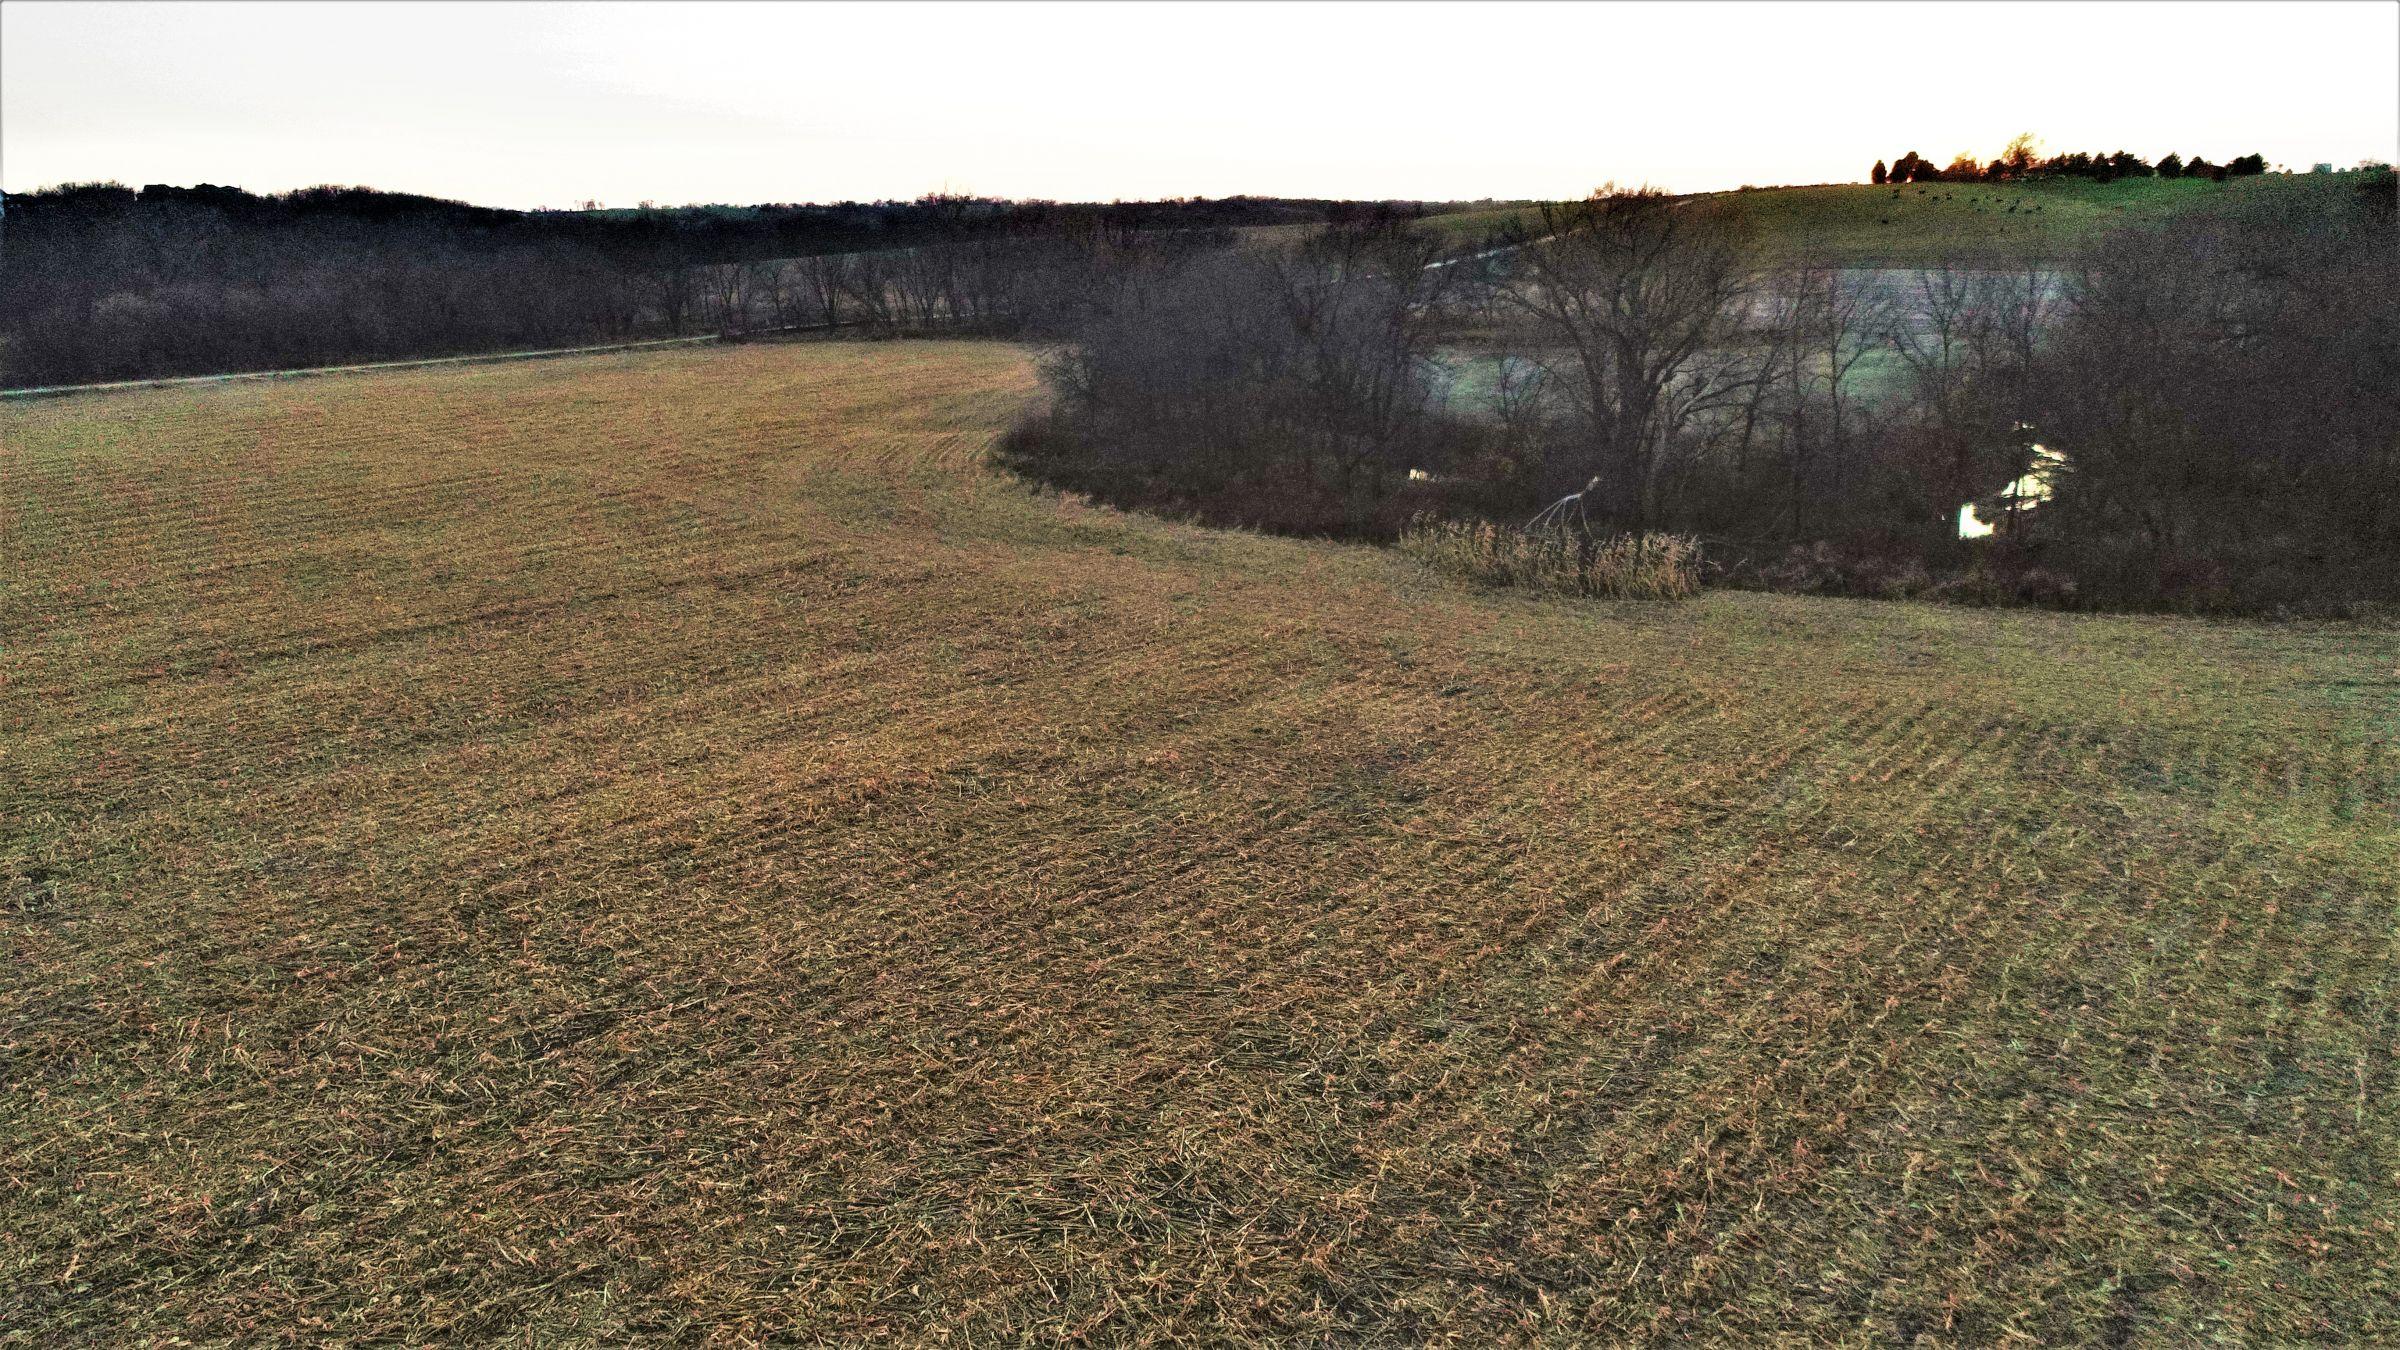 land-madison-county-iowa-20-acres-listing-number-15234-5-2020-11-10-010435.JPG